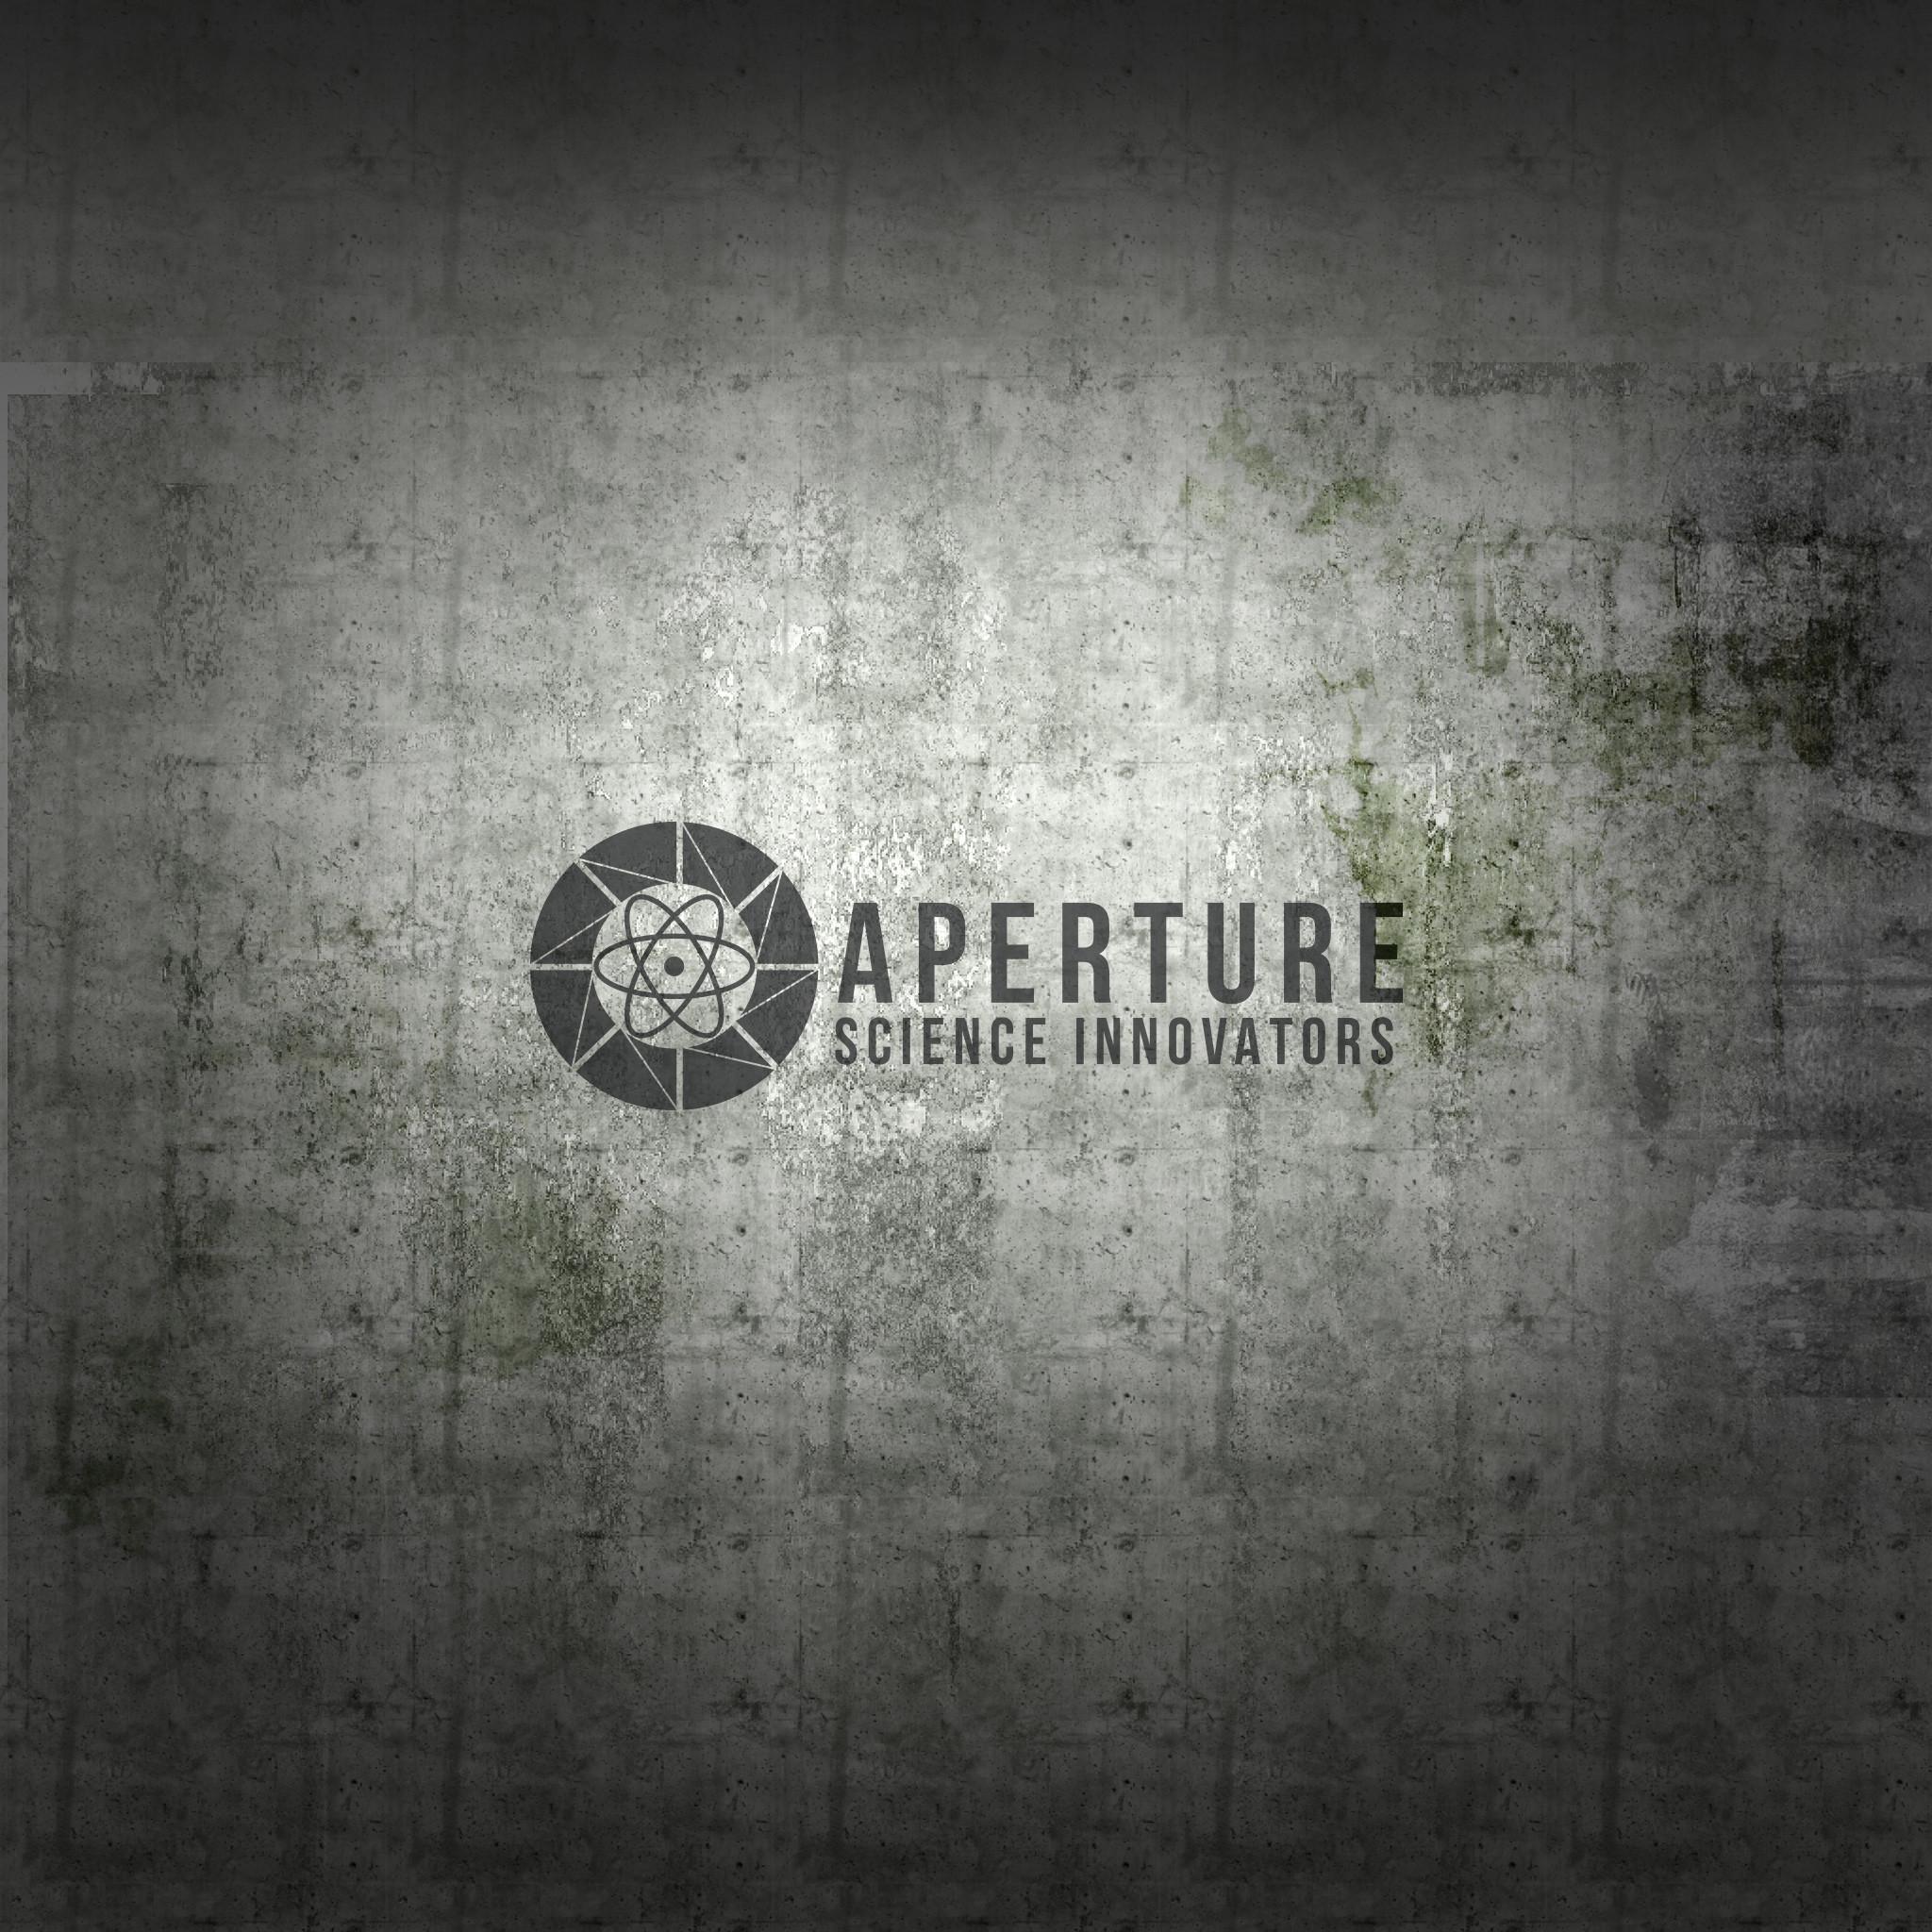 aperture-science-innovators-landscape-stone-wall.jpg2015-11-29 01:141.2 MB  …